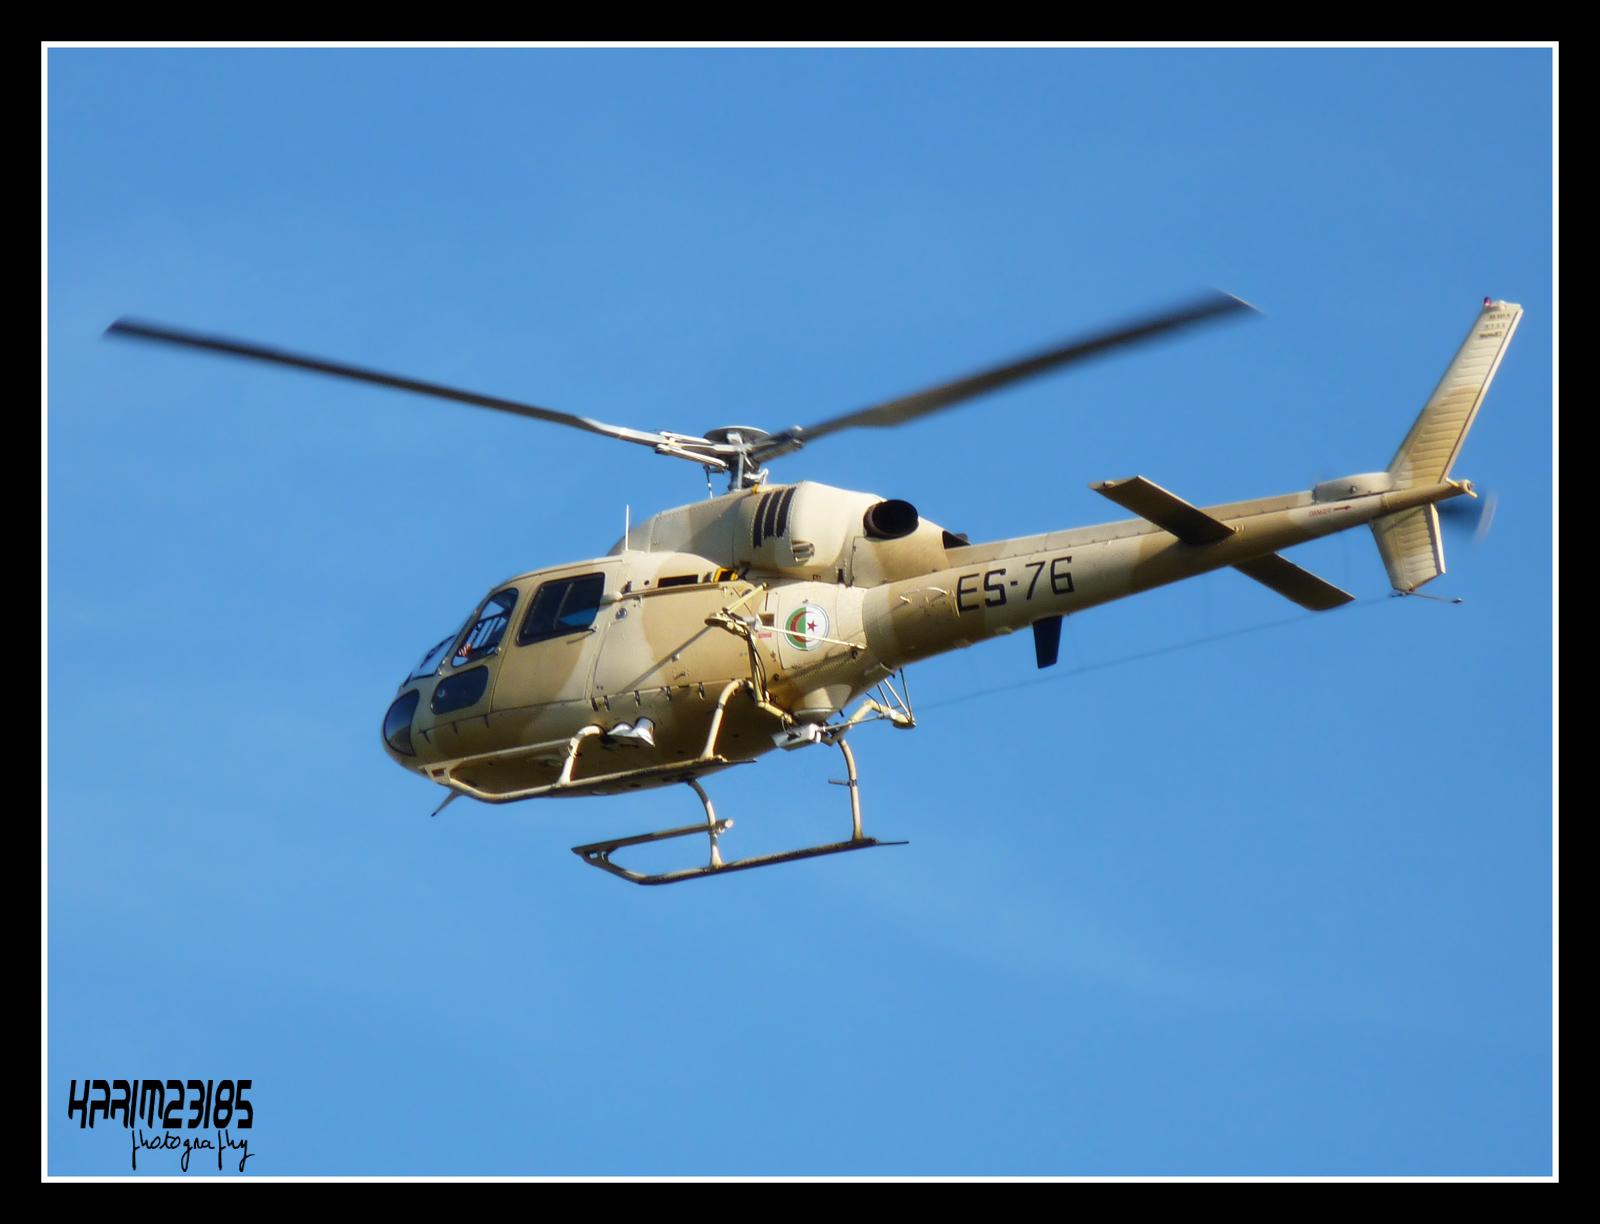 صور مروحيات القوات الجوية الجزائرية Ecureuil/Fennec ] AS-355N2 / AS-555N ] - صفحة 6 26867060014_59ac666c25_o